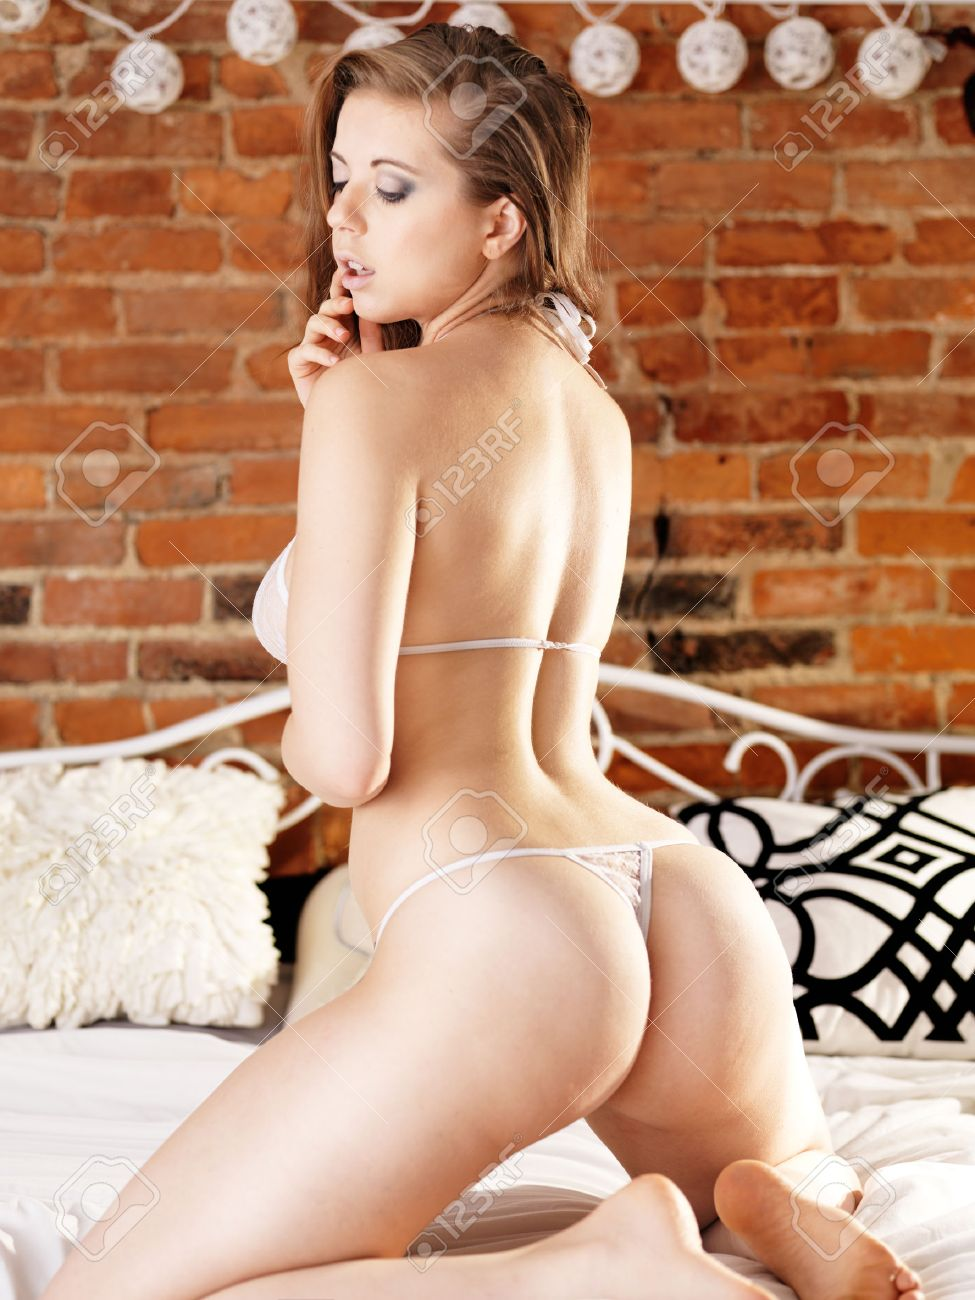 Hardcore brunette adult sex